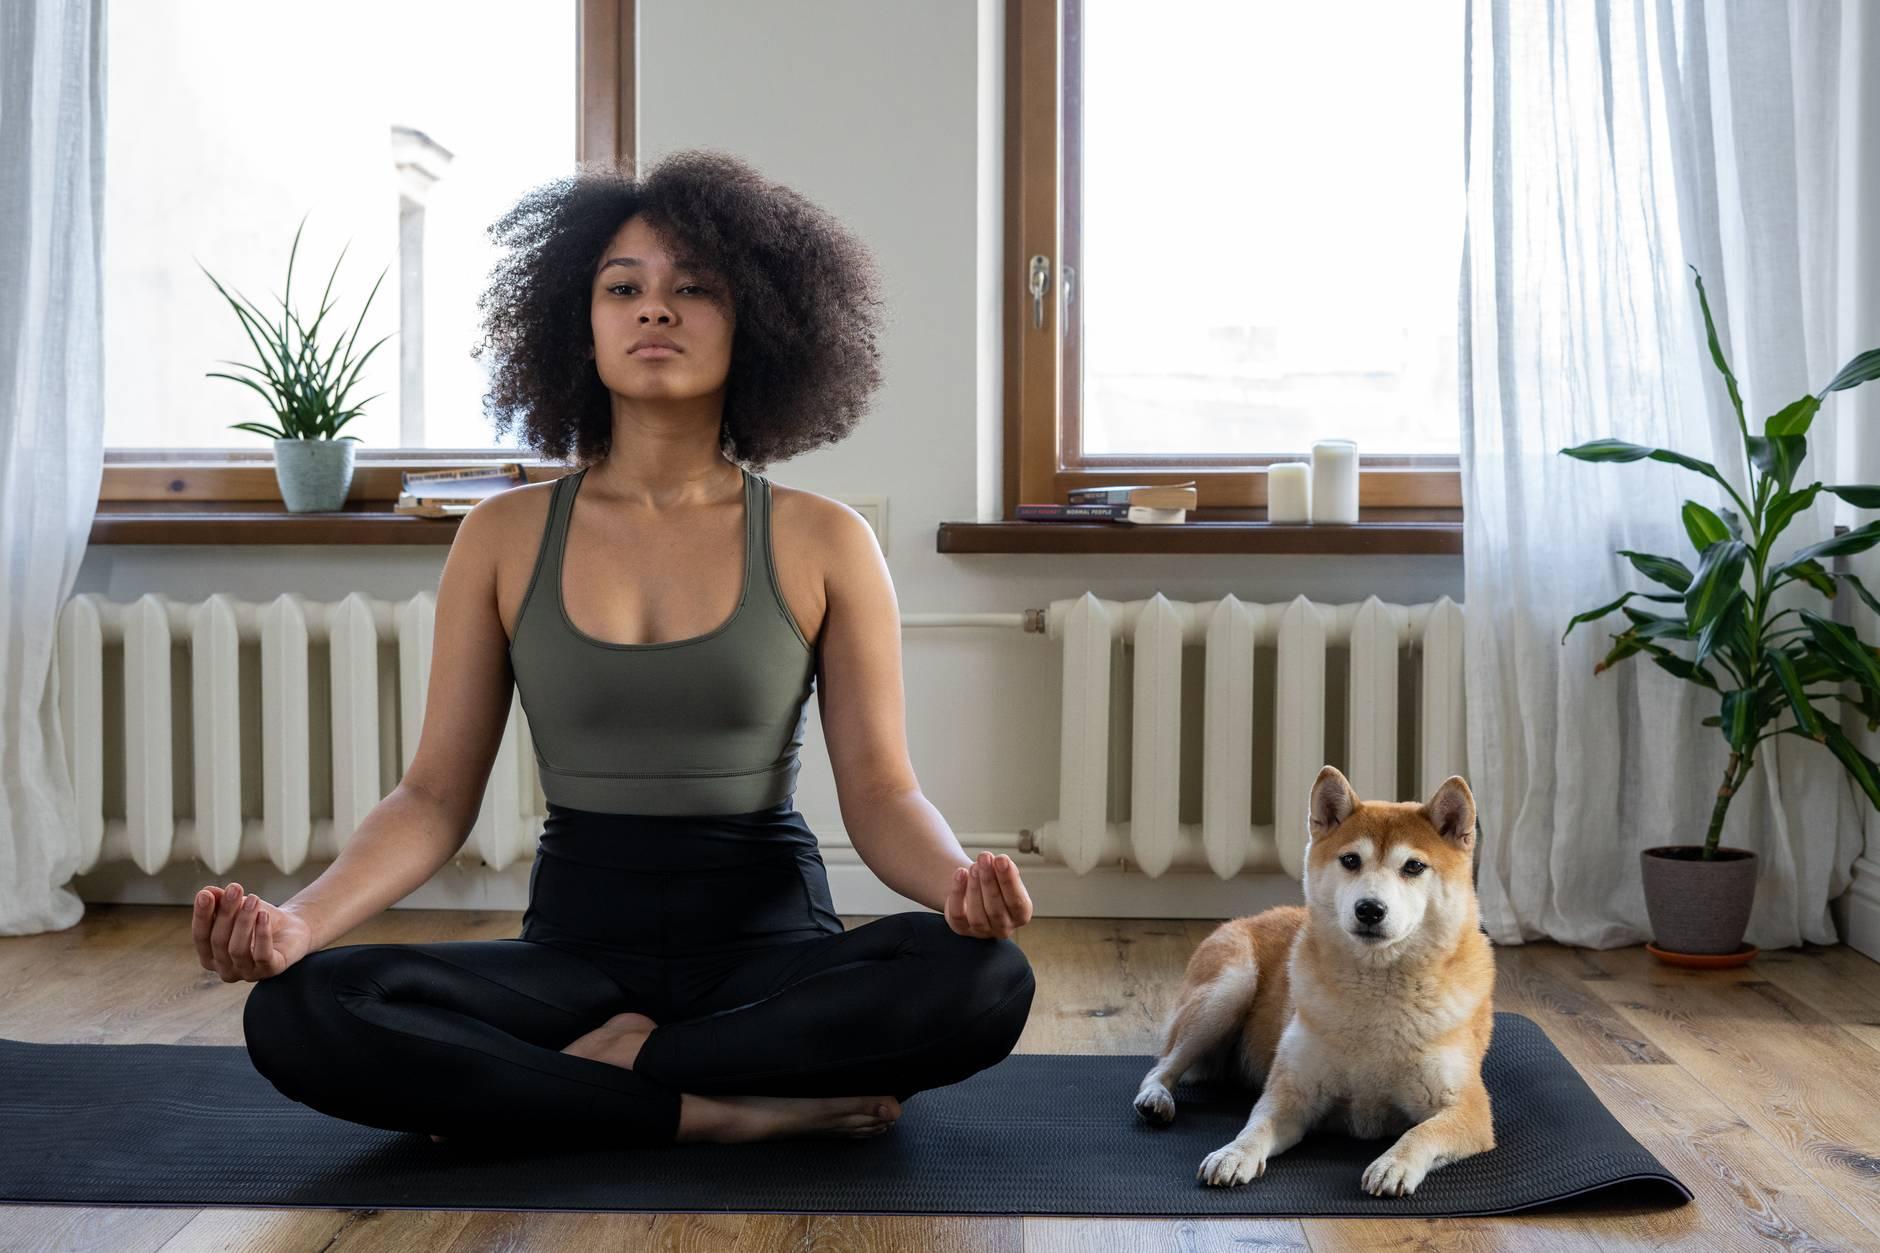 breathwork, pranayam, meditation, healing the subtle body with pranayam techniques